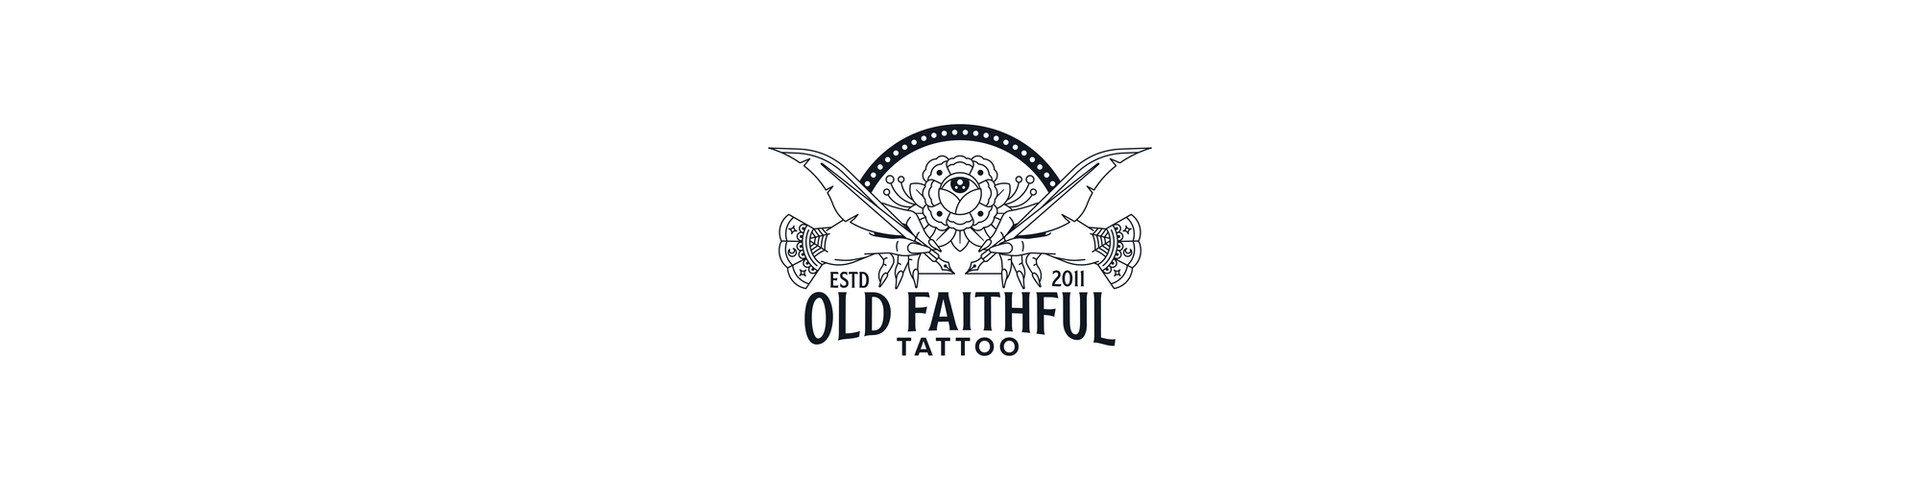 Old Faithful Tattoo - Final_Quill Hands